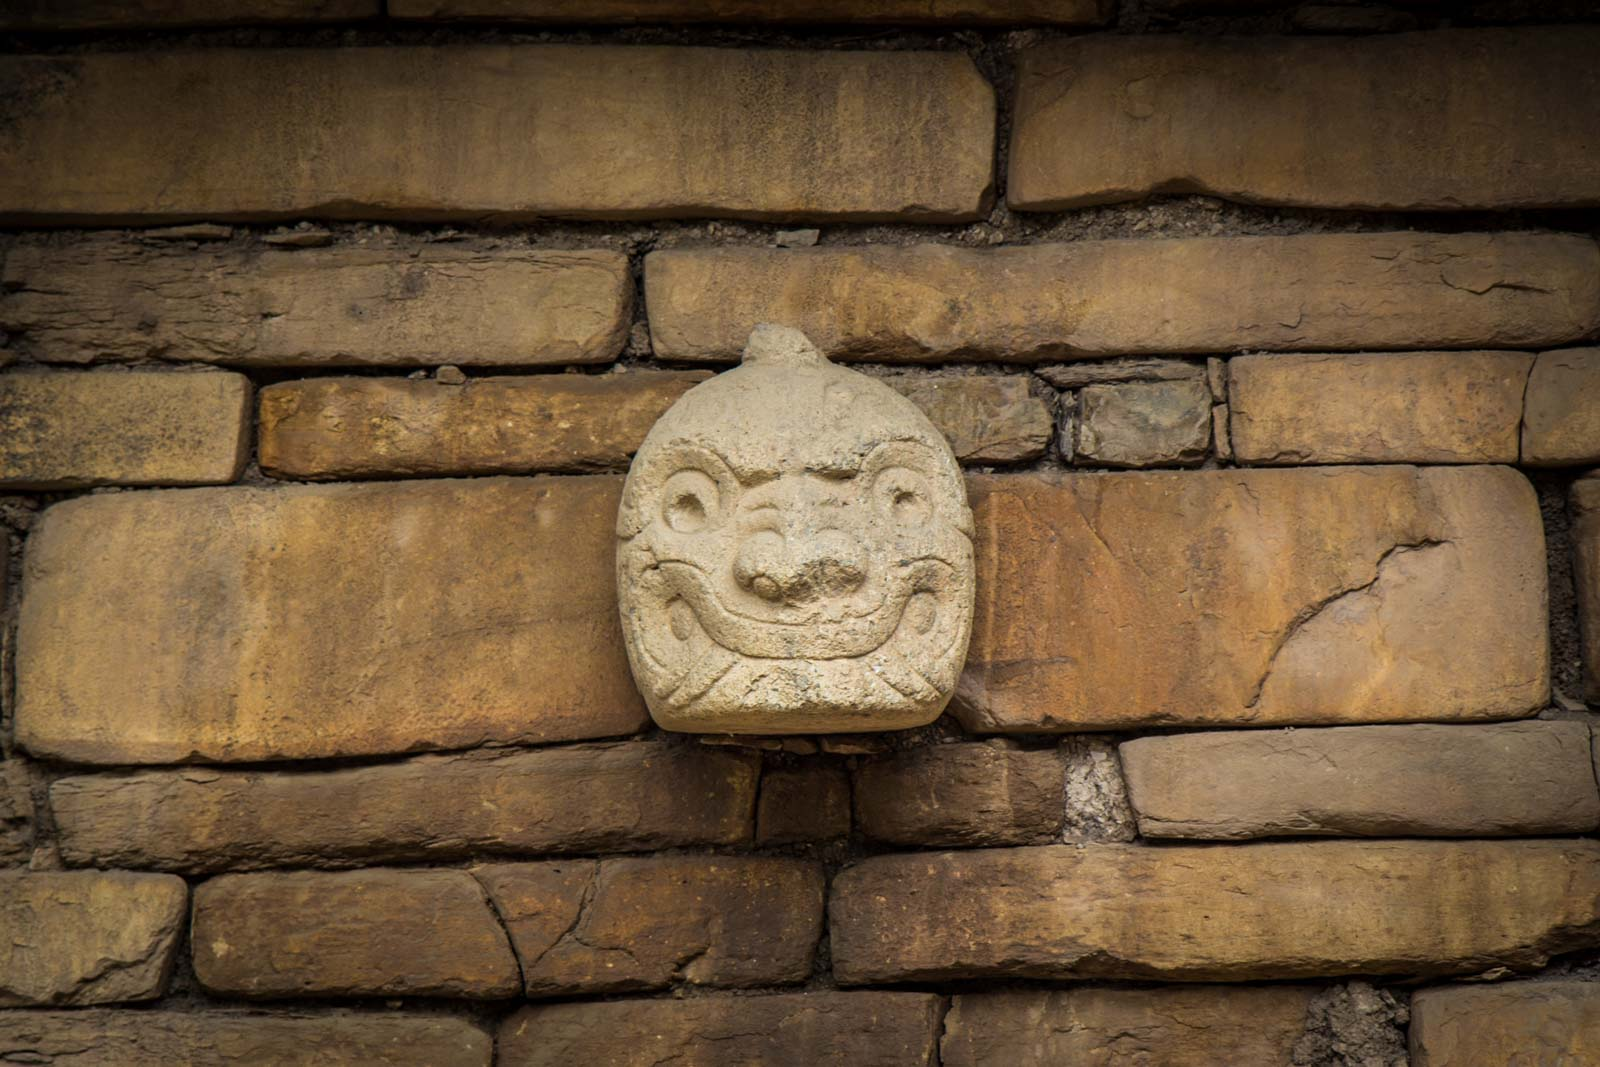 Chavin de Huantar, Peru, Chavin culture